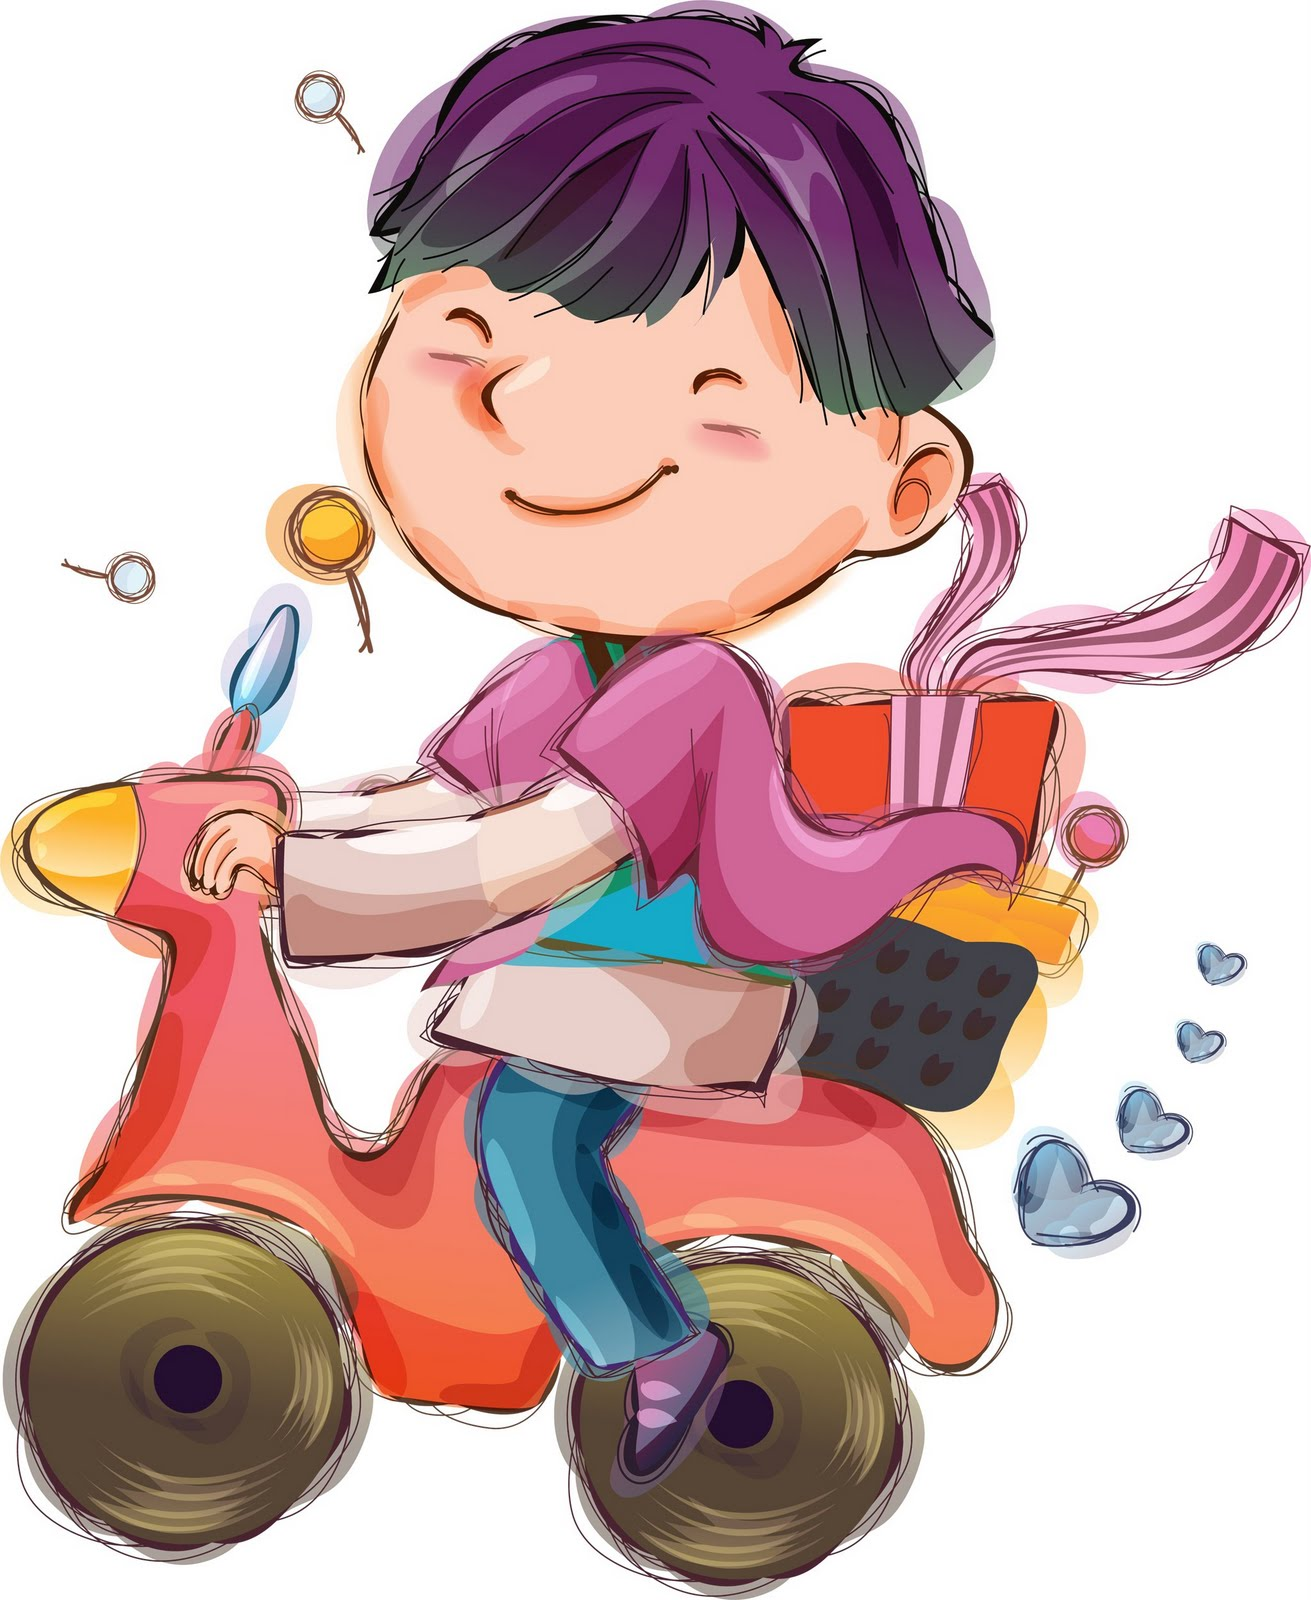 Bonitos dibujos infantiles con ni os cositasconmesh - Bebes dibujos infantiles ...